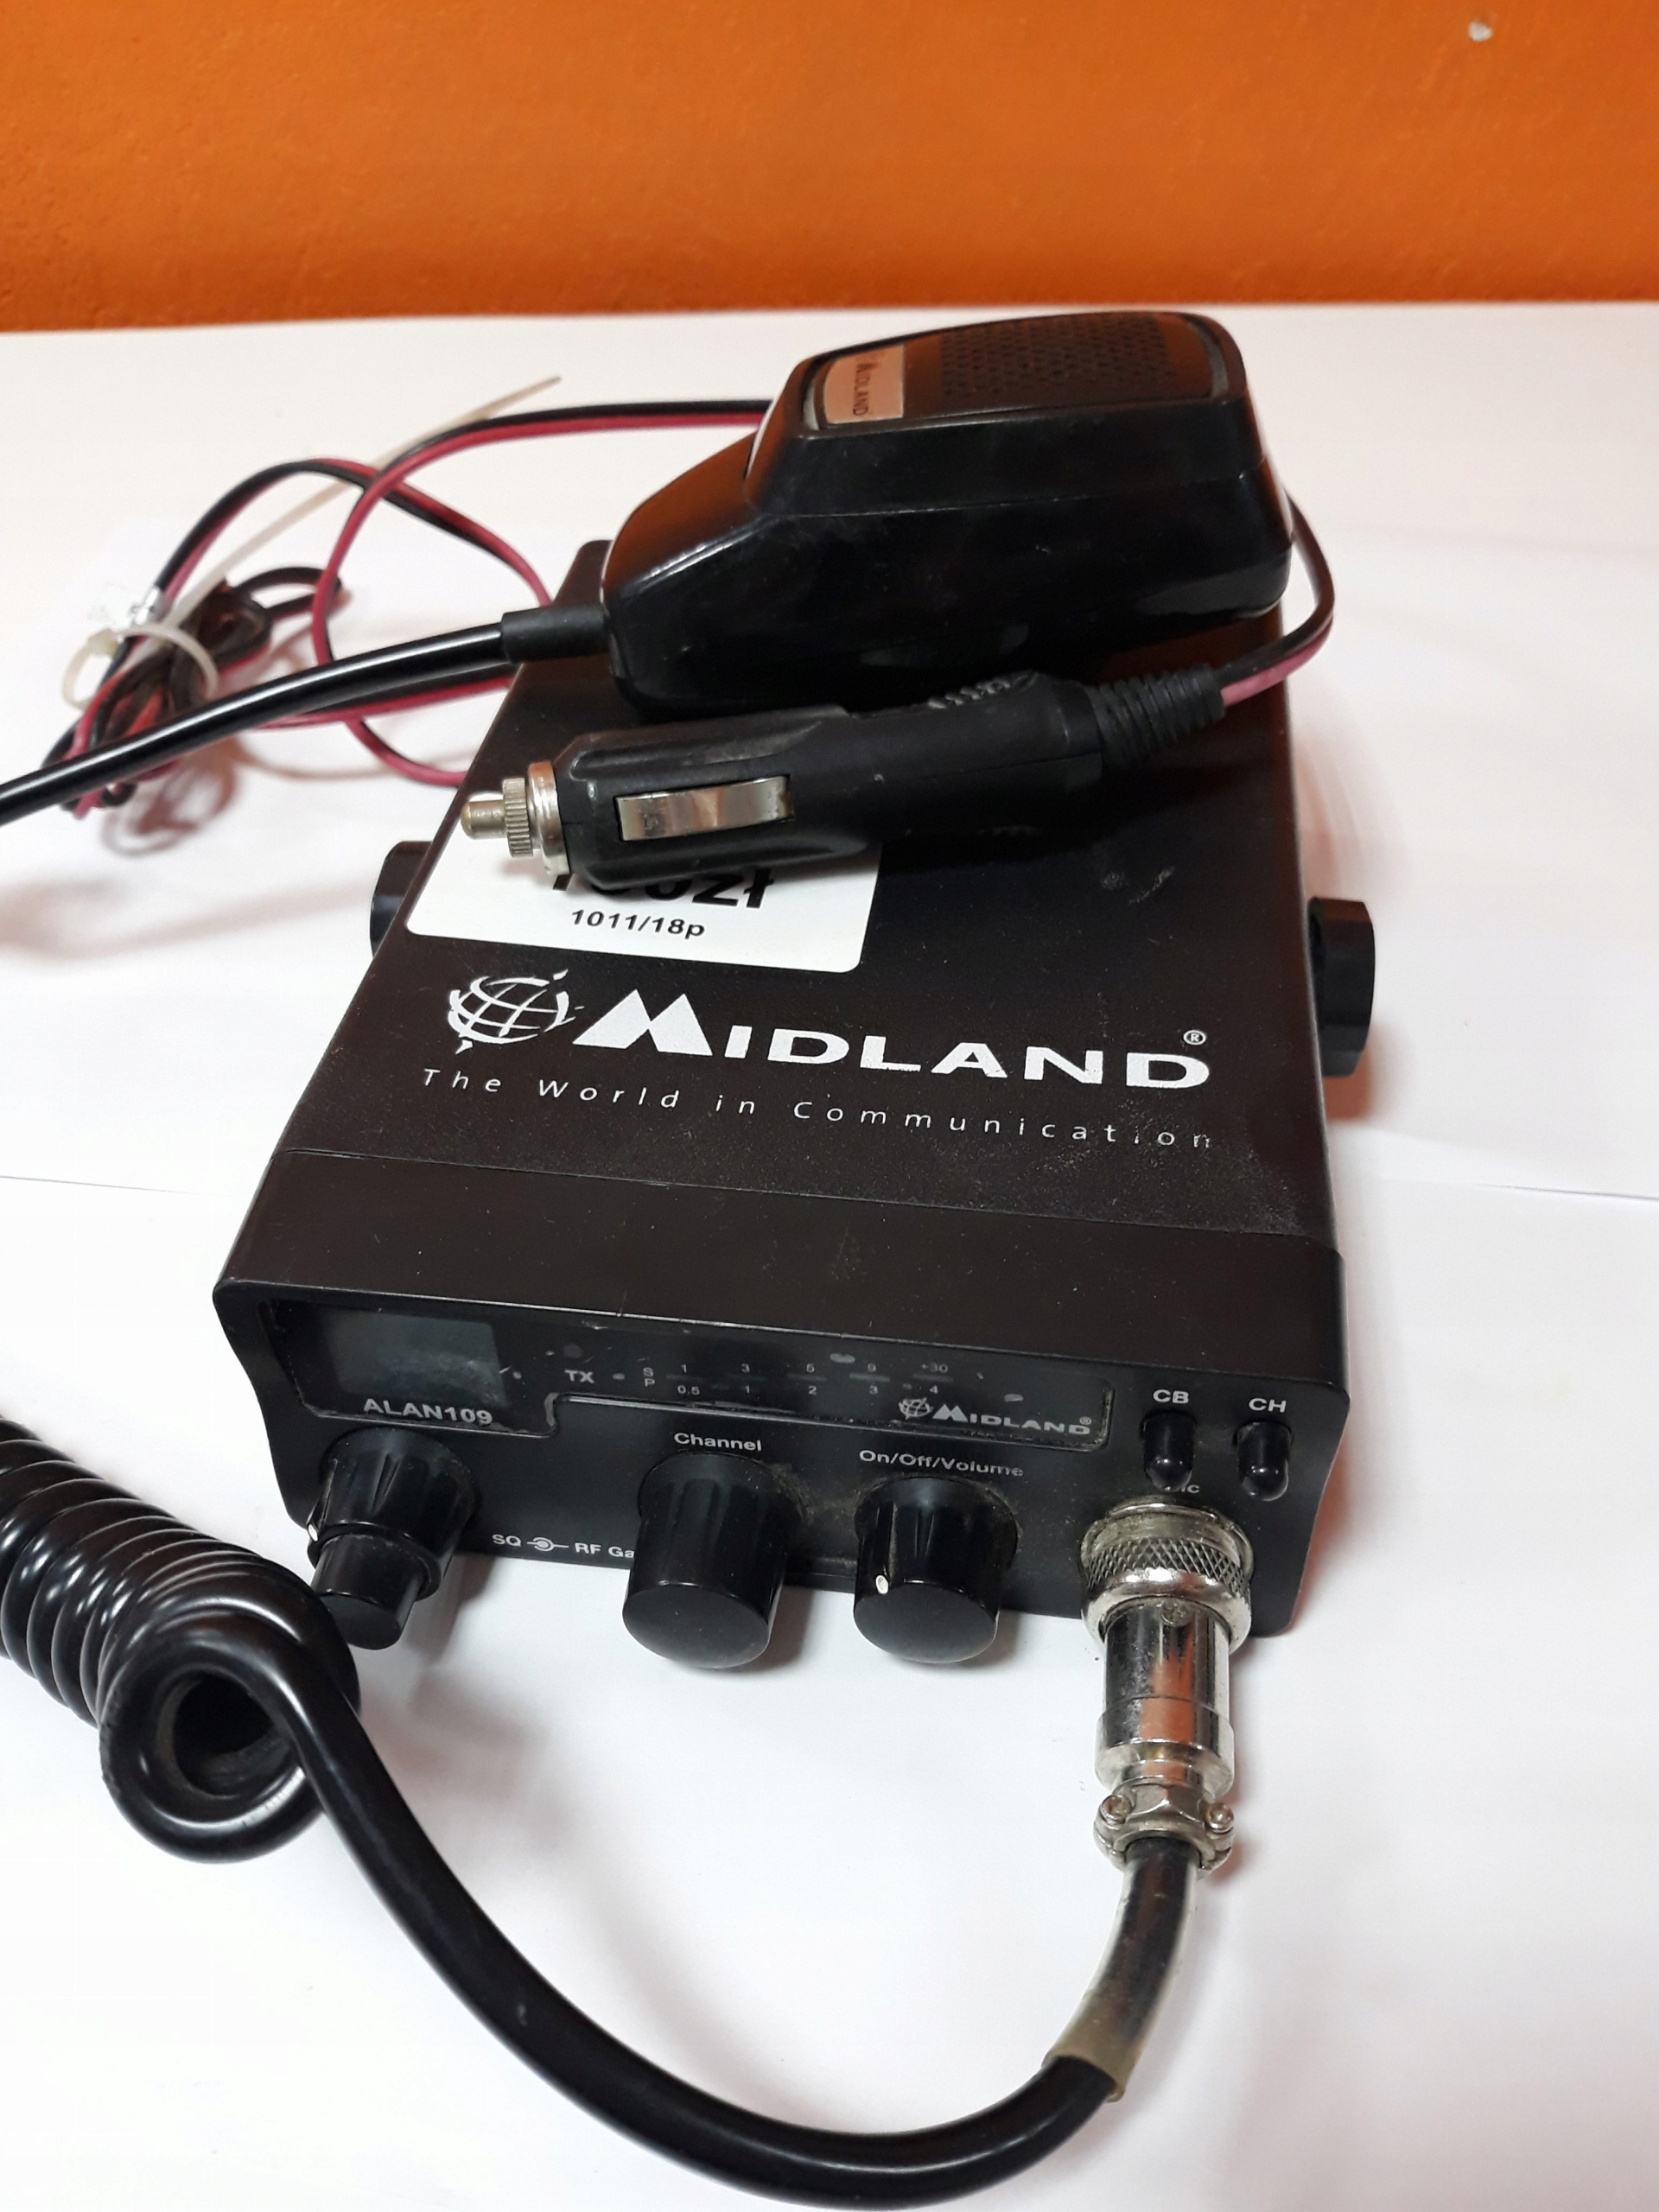 Radio CB MIDLAND Alan 109